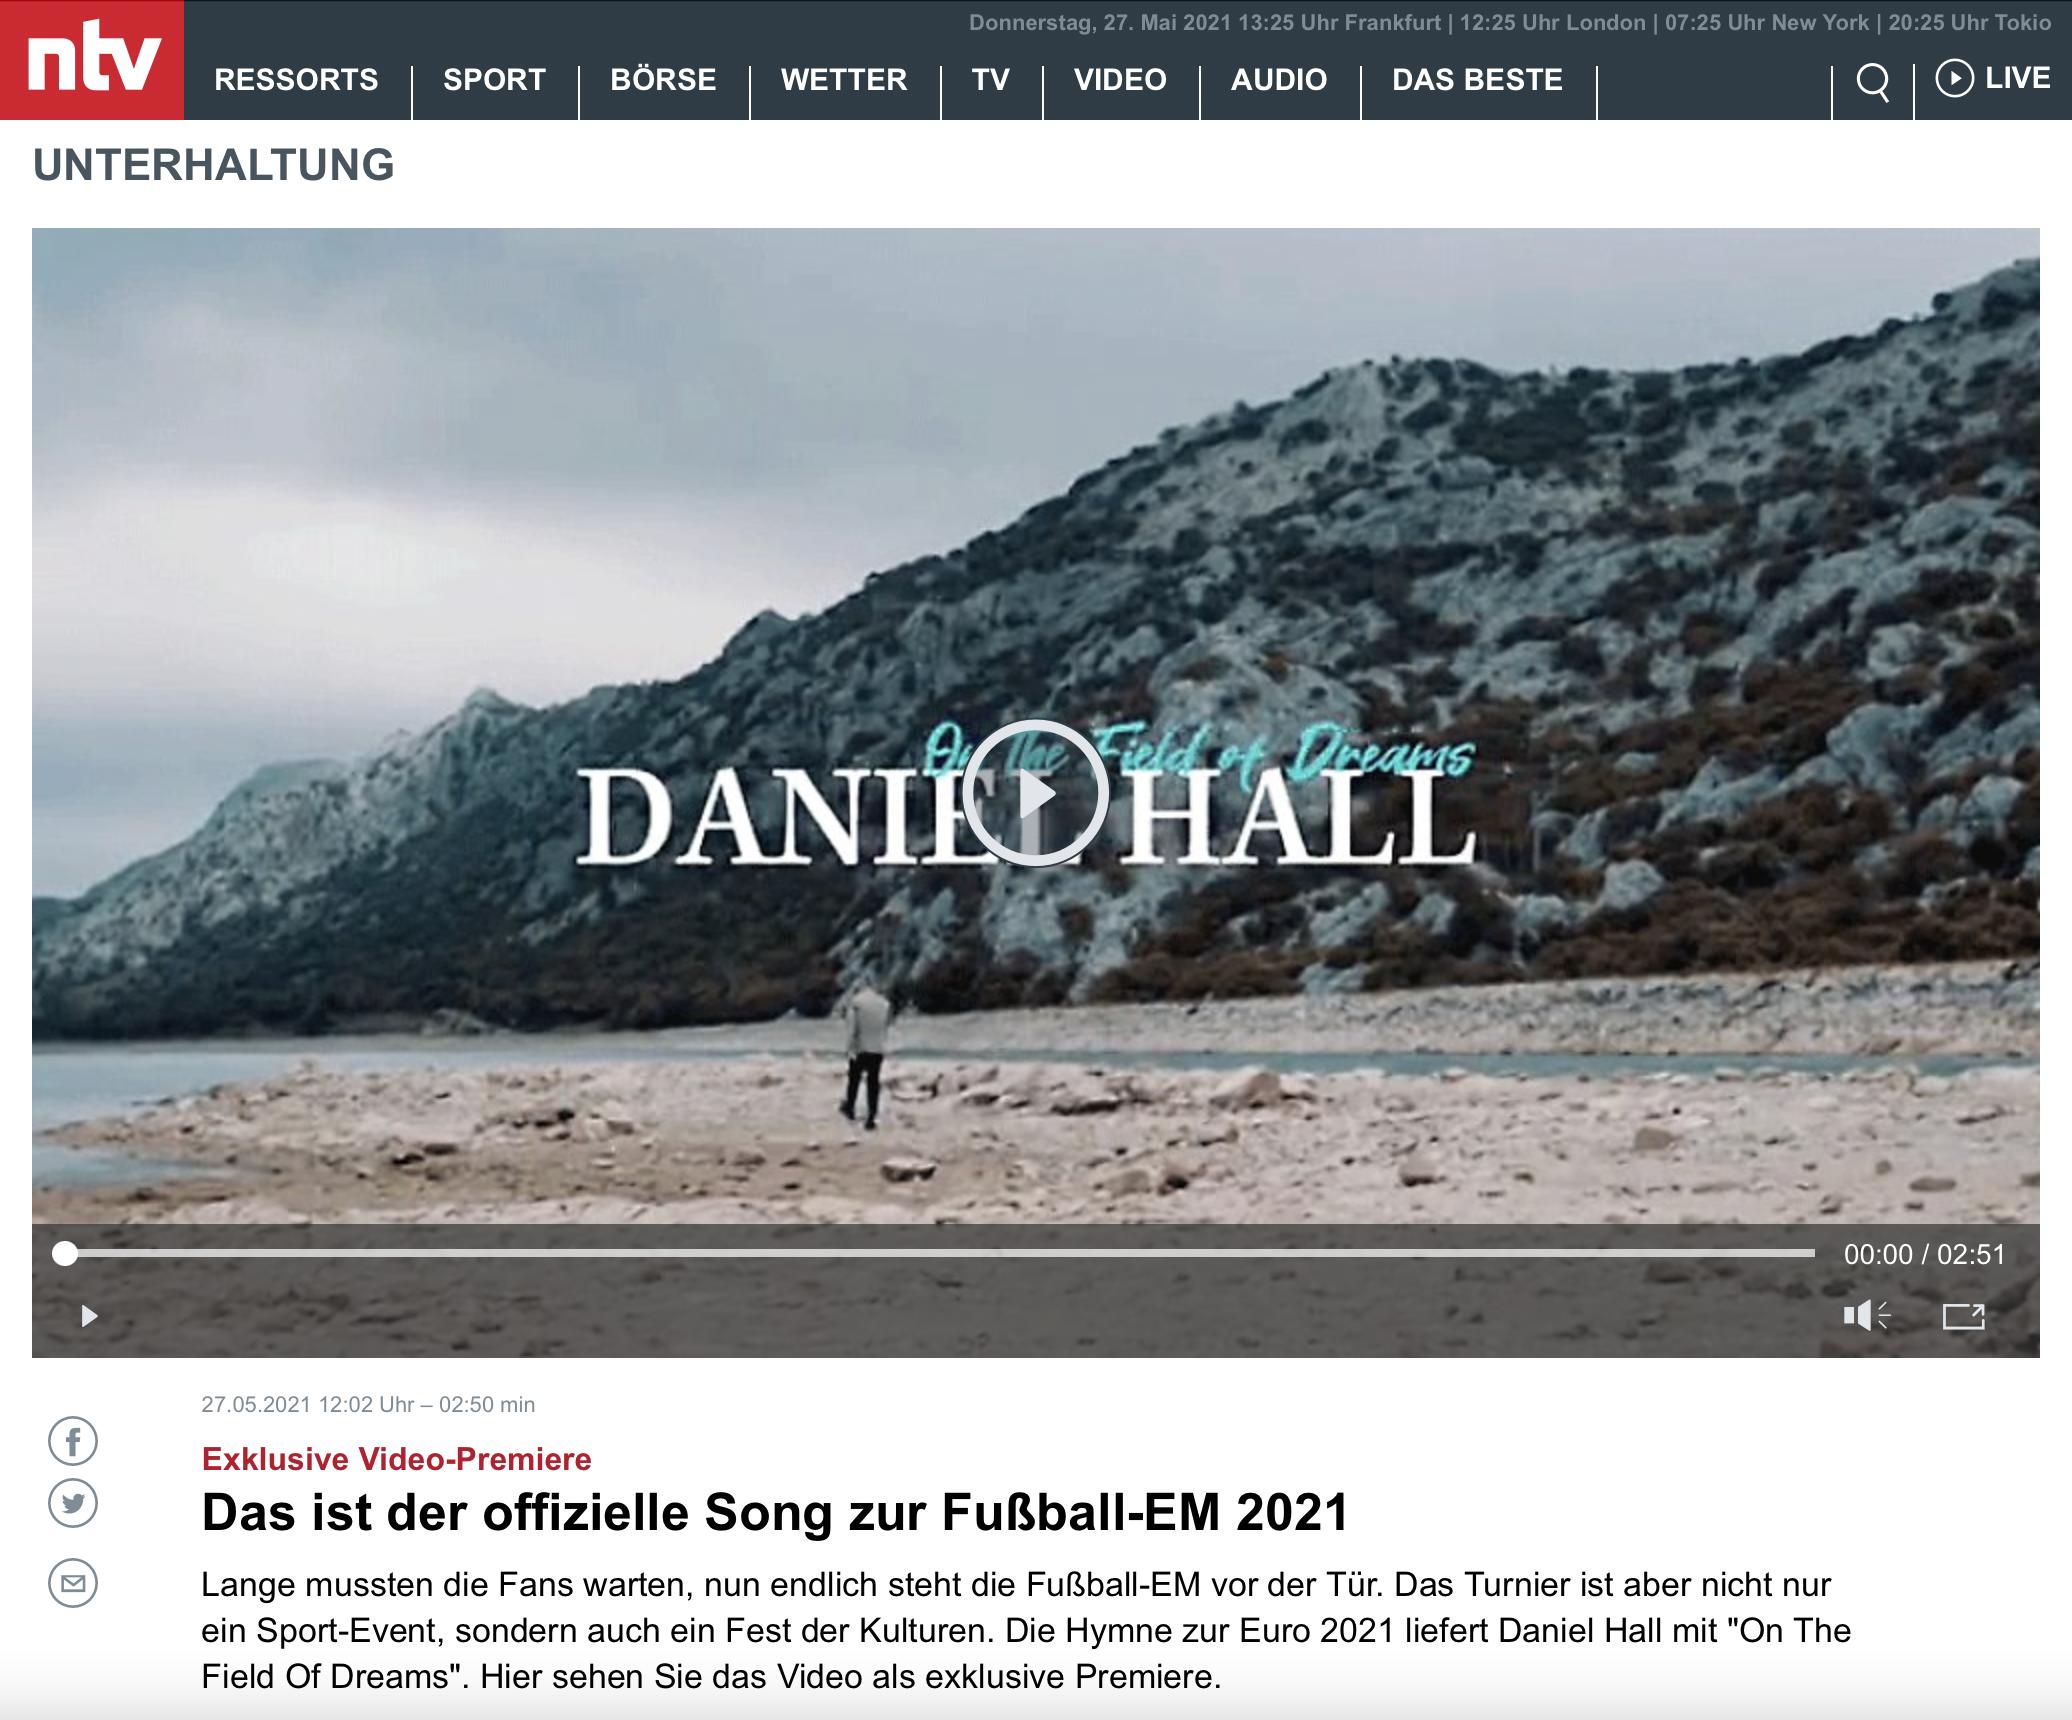 DanielHall-NTV-Video-Premiere